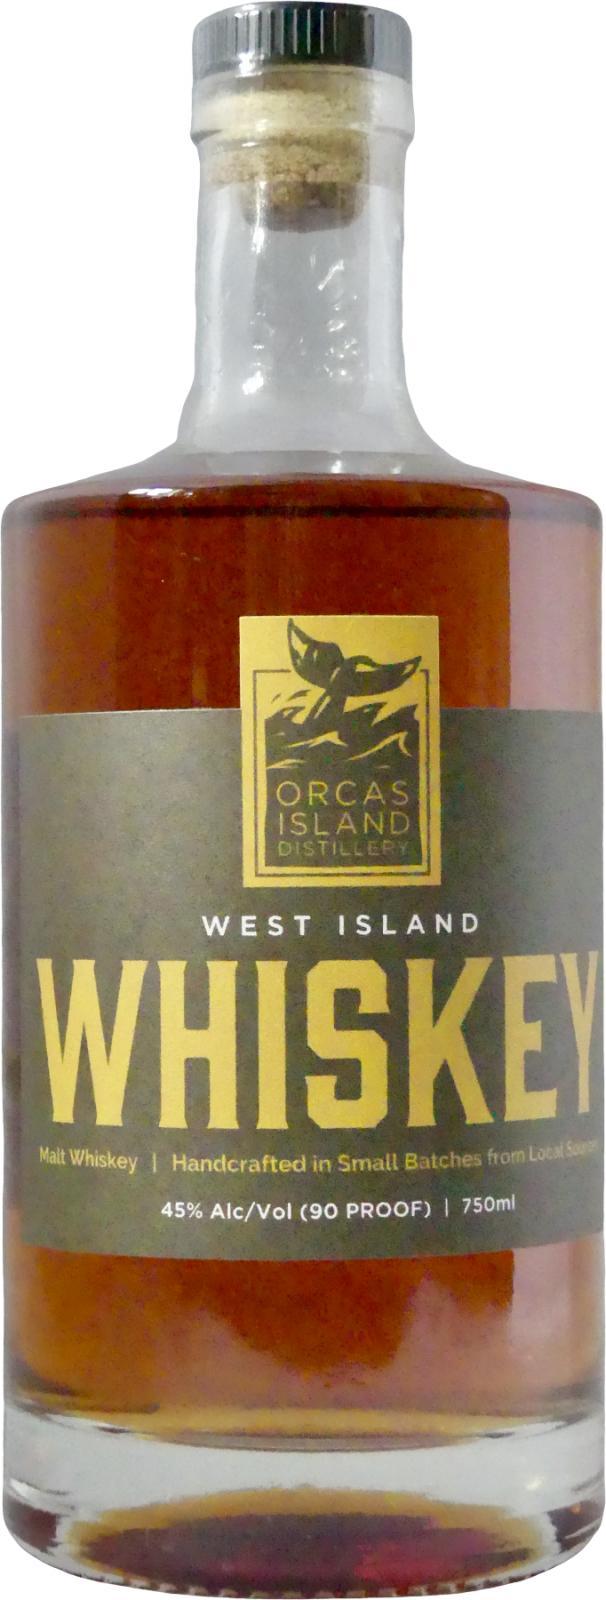 Orcas Island West Island Whiskey